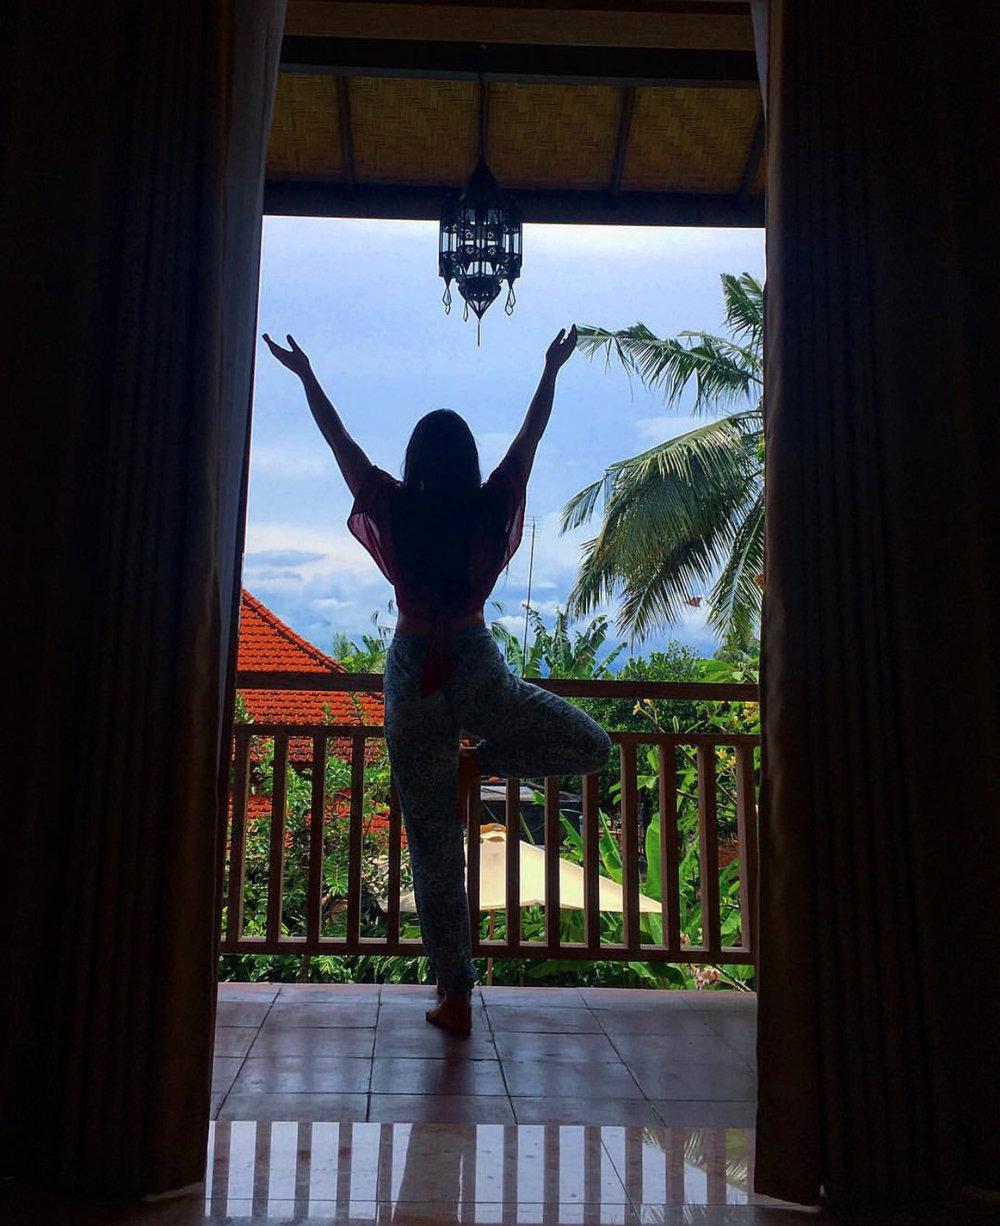 Enjoy my balcony views at the Bali Spirit Festival, 2017.